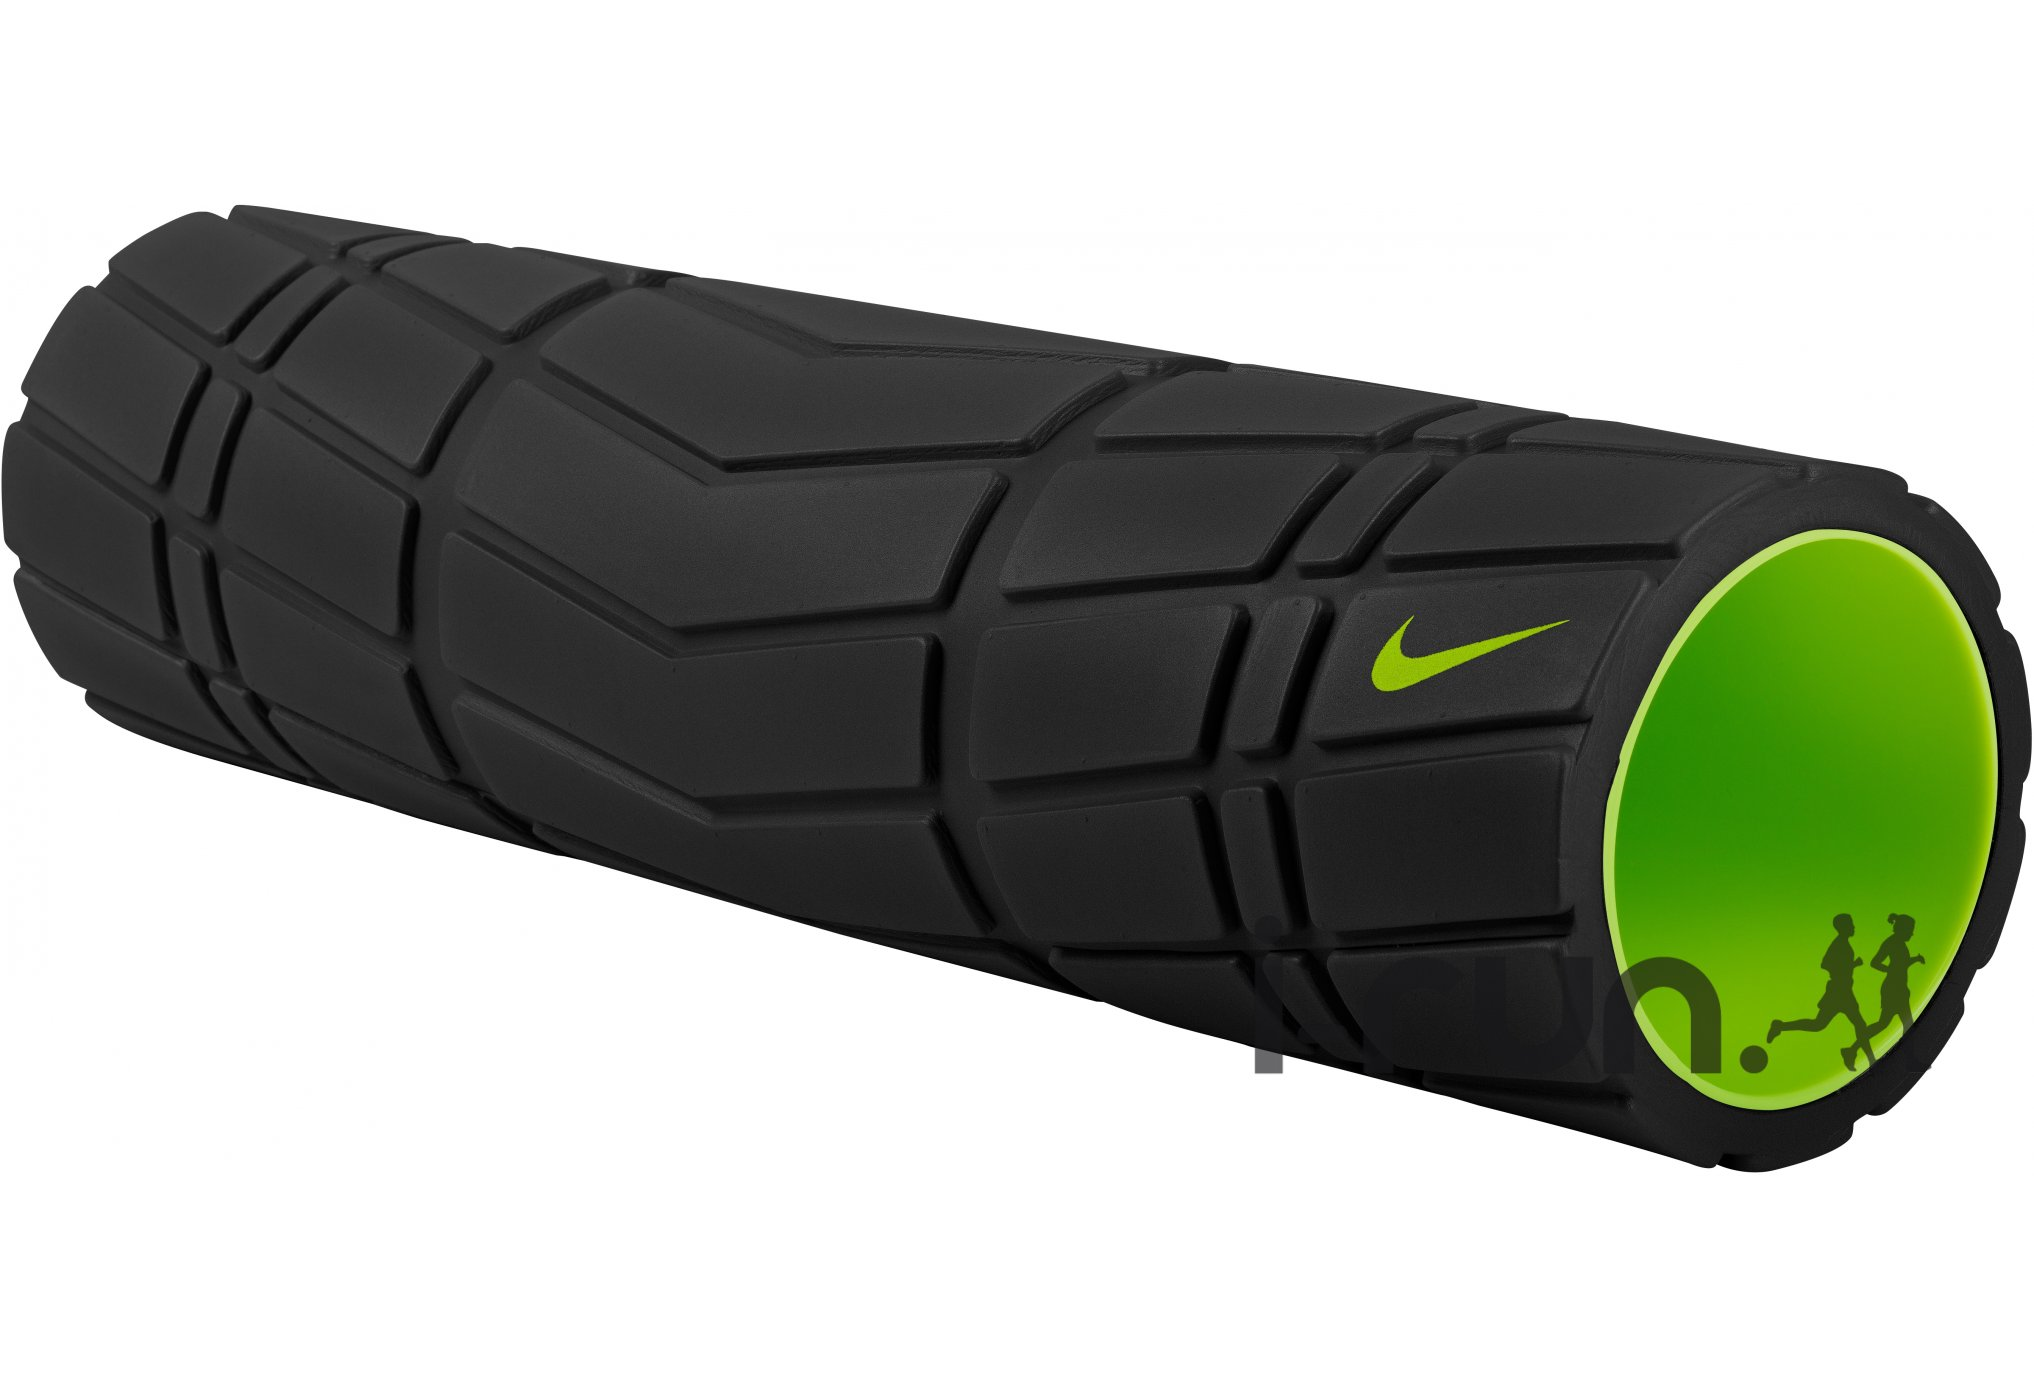 Nike Rouleau Texturé Foam Roller Training